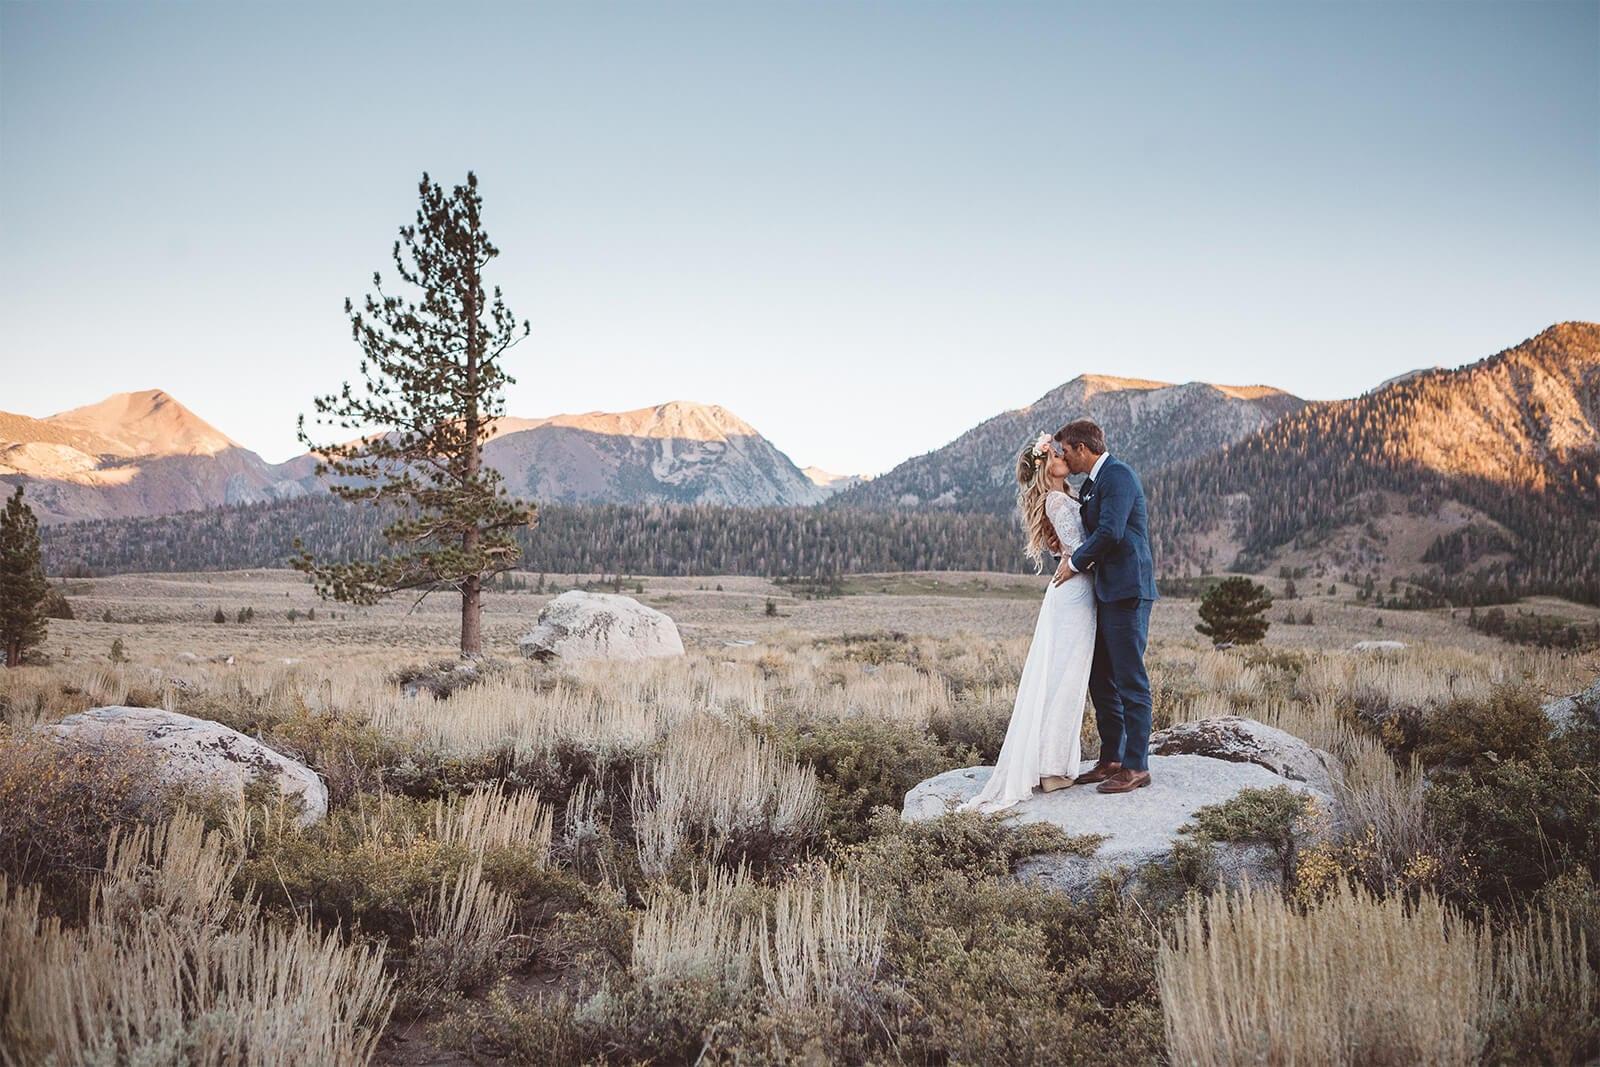 Bride wearing Grace Loves Lace Inca Gown kissing groom on rock